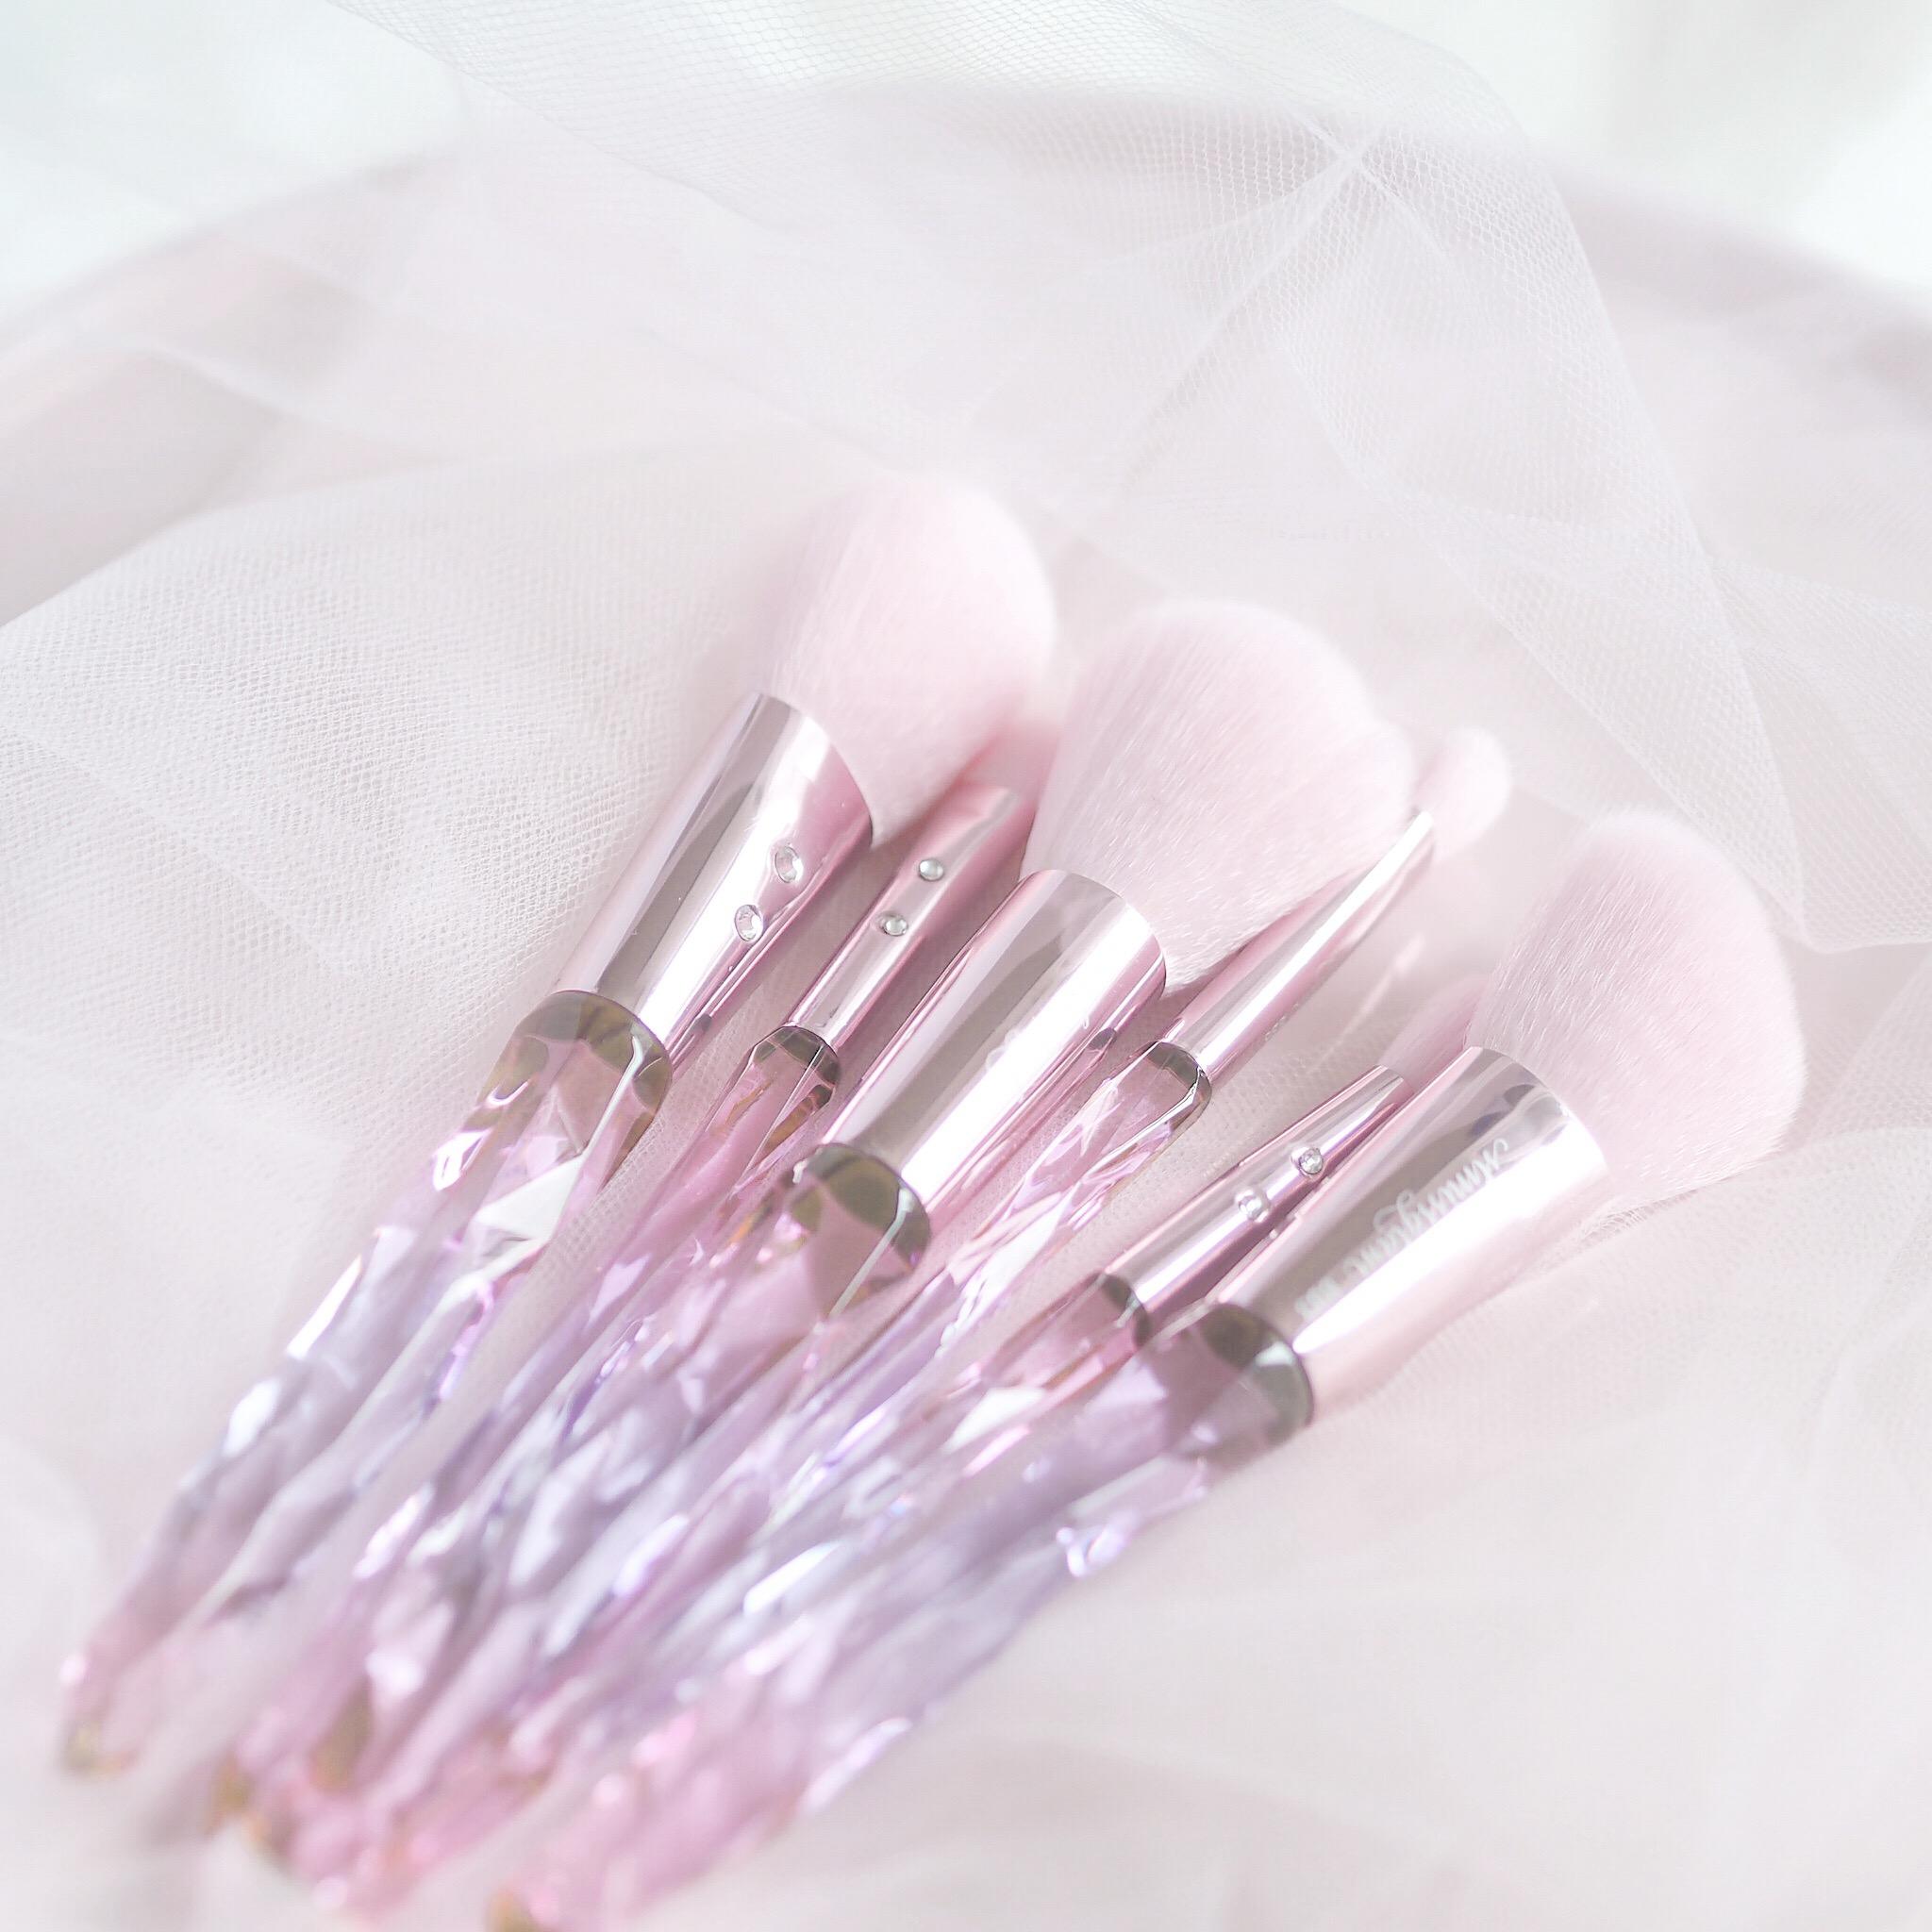 Fit For A Princess: Bling Bling Makeup Brush Set SLMissGlam | Love Catherine